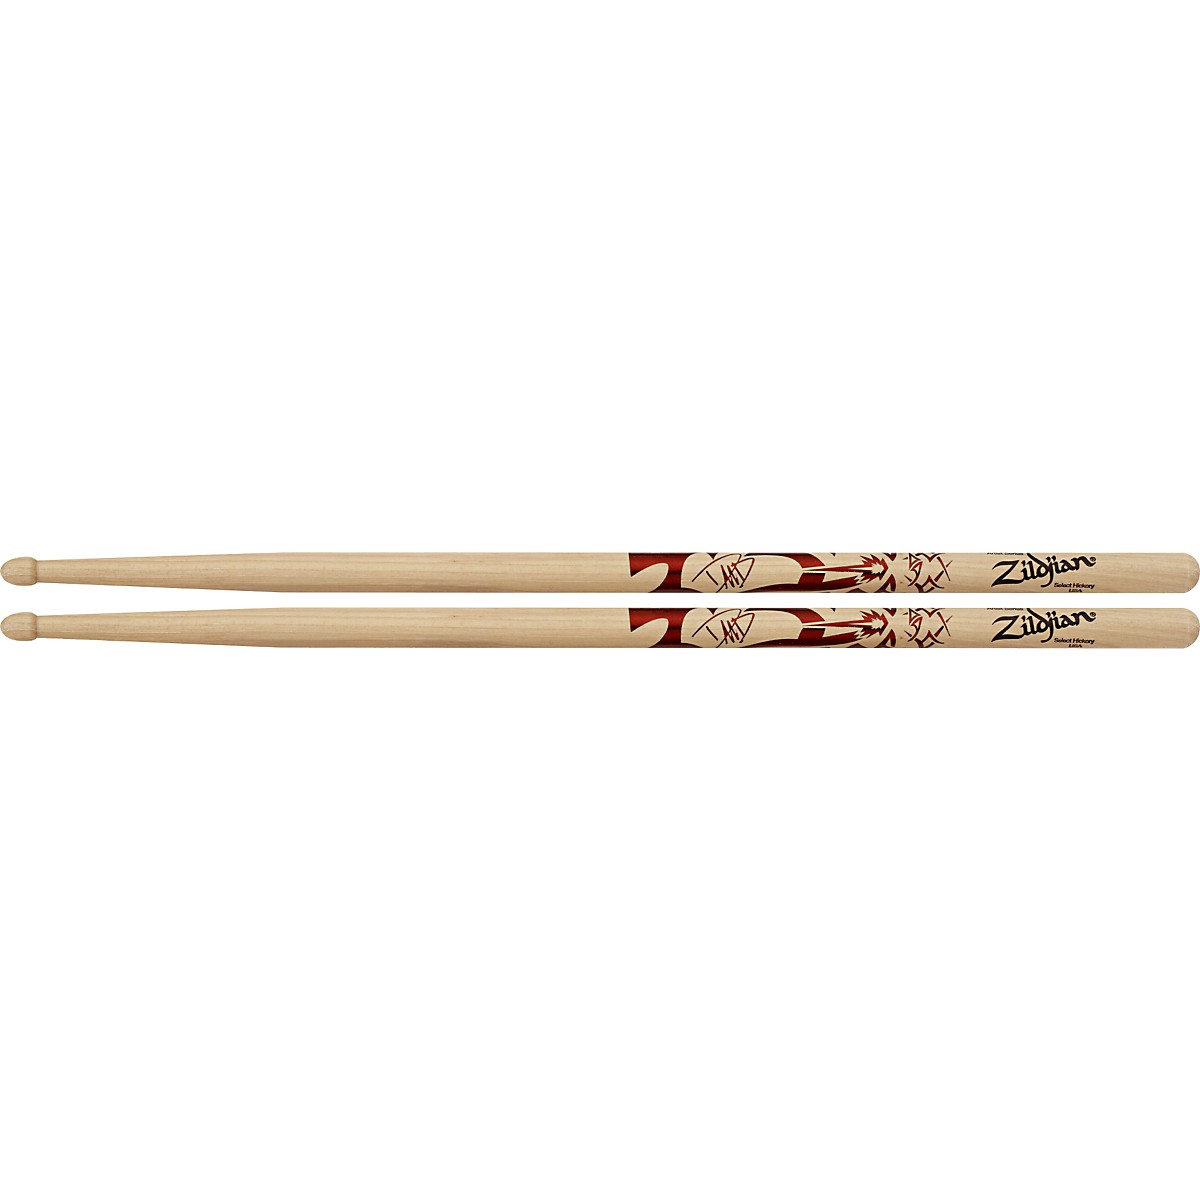 Zildjian Dave Grohl Signature Drumsticks